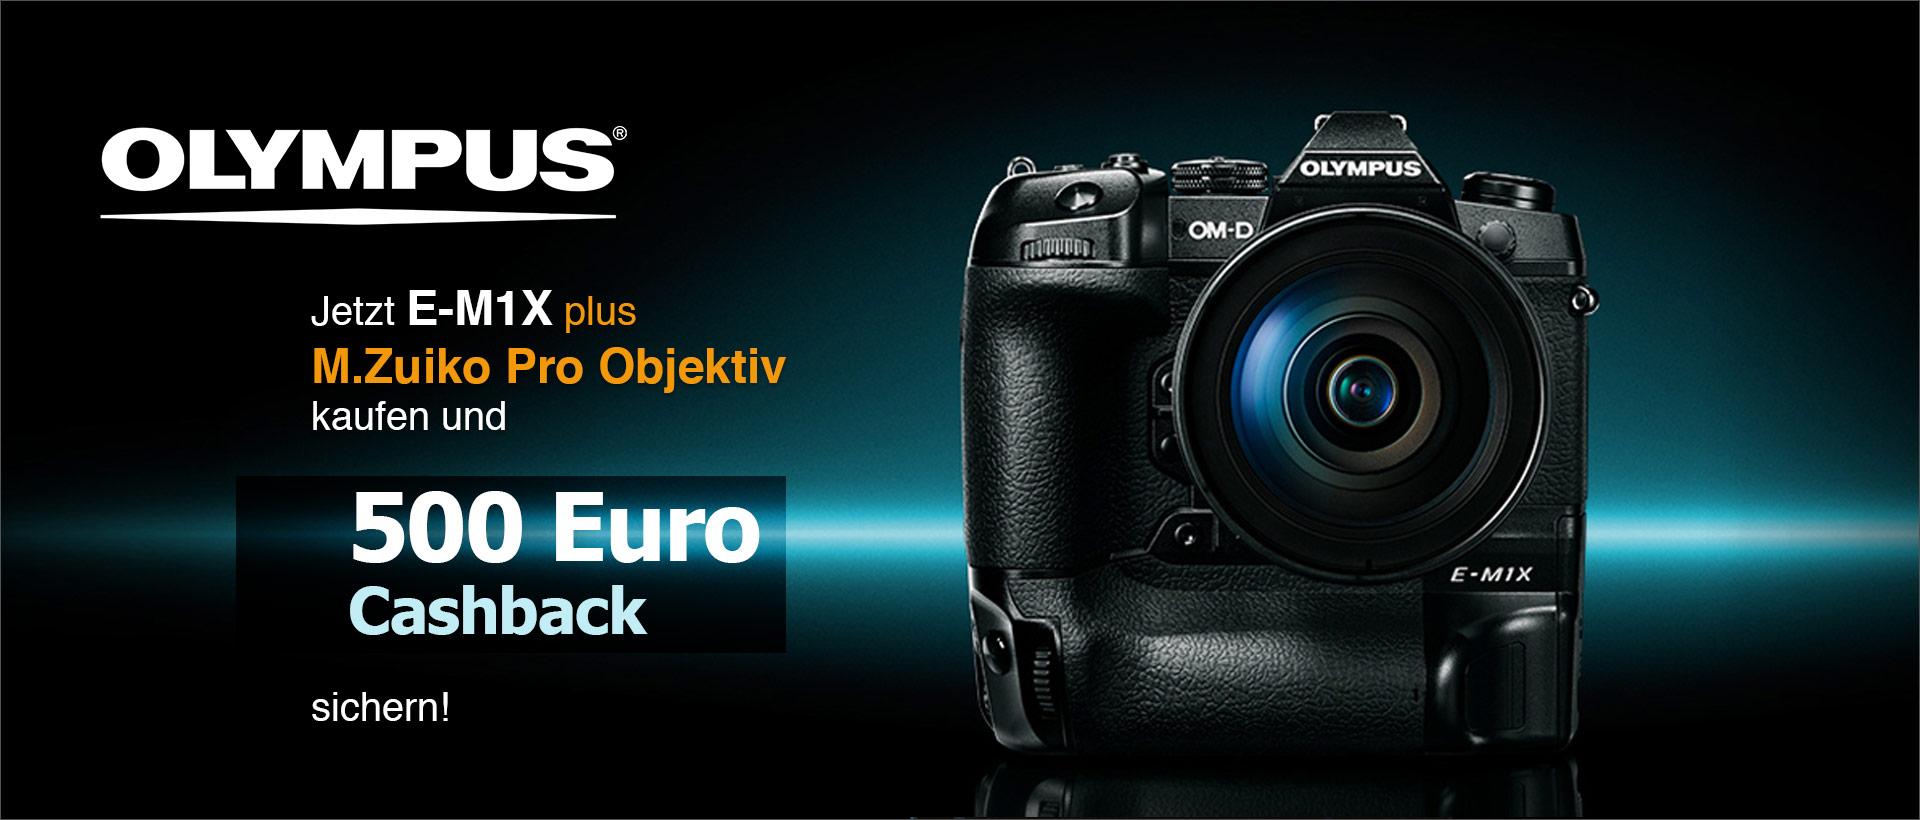 Sony OM-D E-M1X 500 Euro Cashback